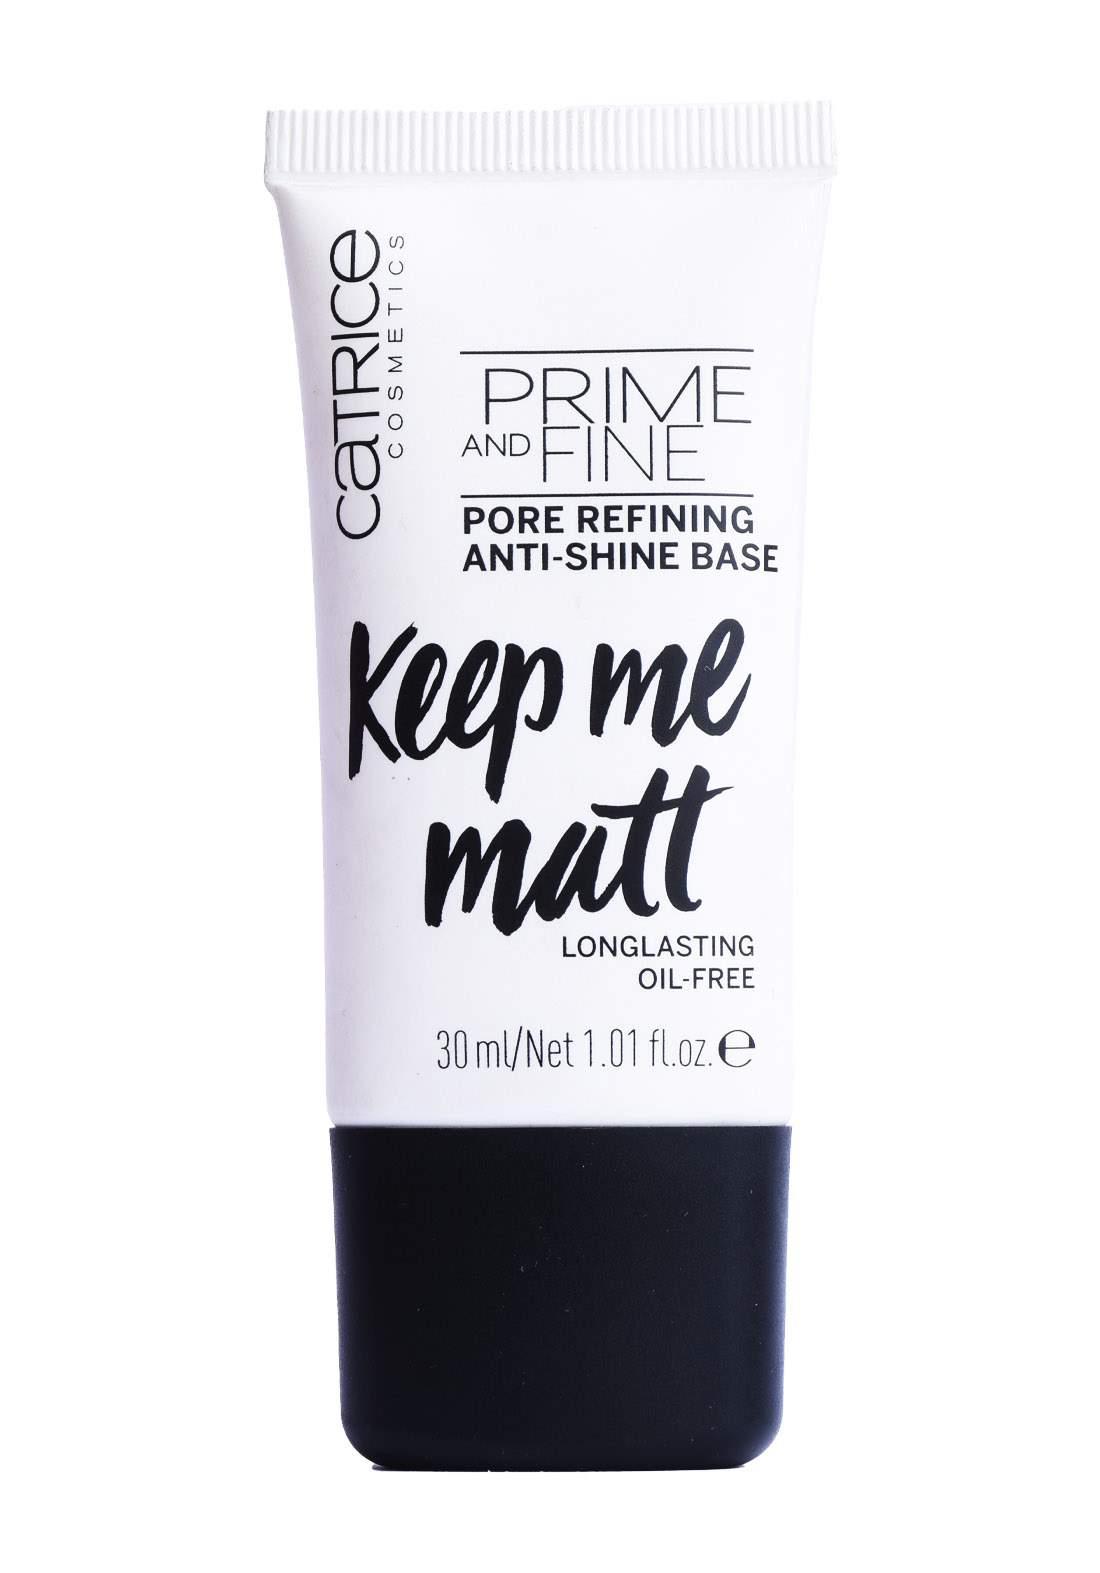 Catrice Cosmetics keep Me Matt Prime   Fine Pore Refining Anti-Shine Base 30ml برايمر